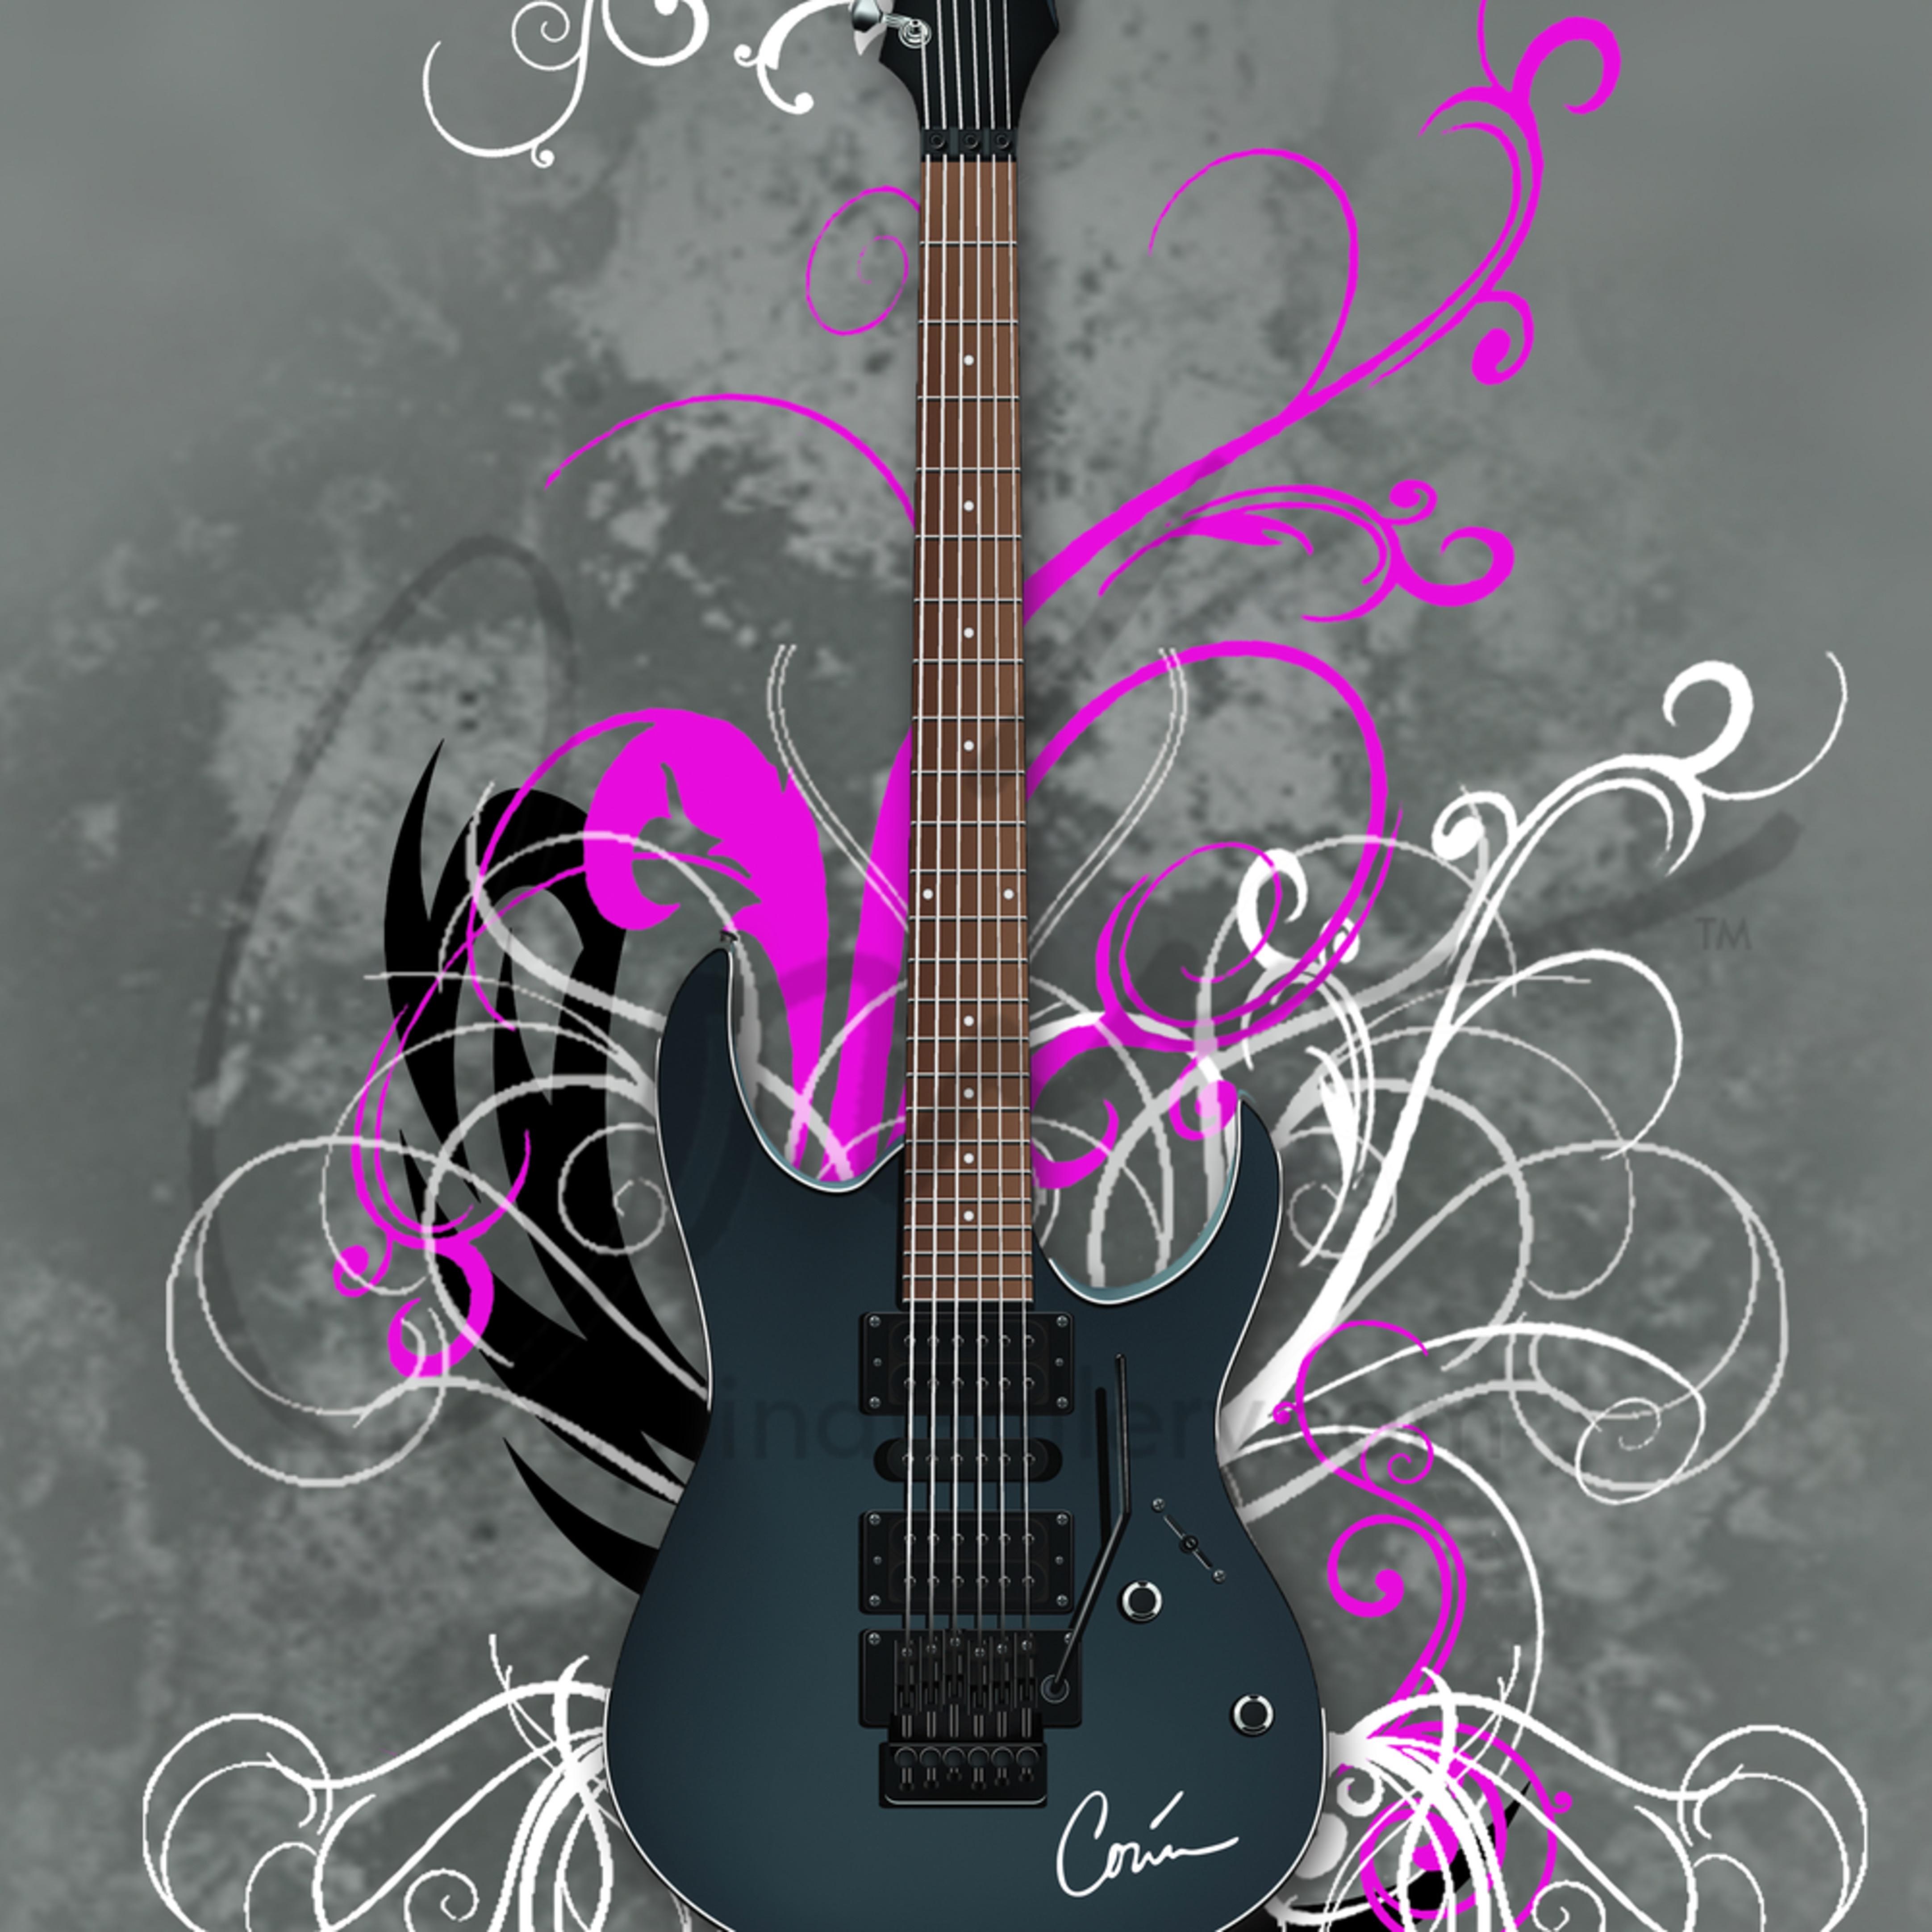 Rocknroll pink sso5we